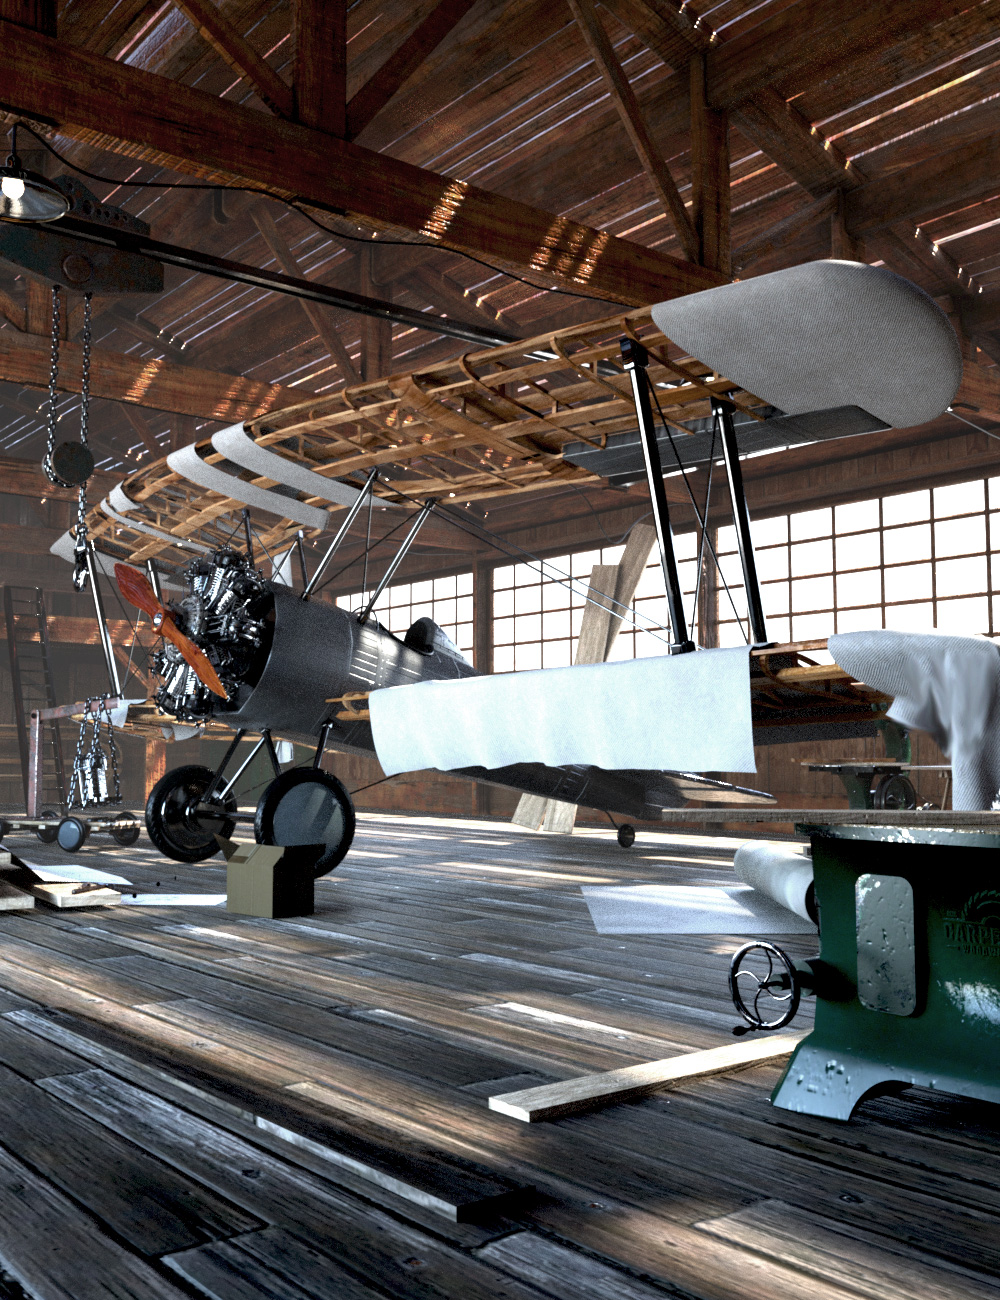 Aircraft Hangar by: Ansiko, 3D Models by Daz 3D